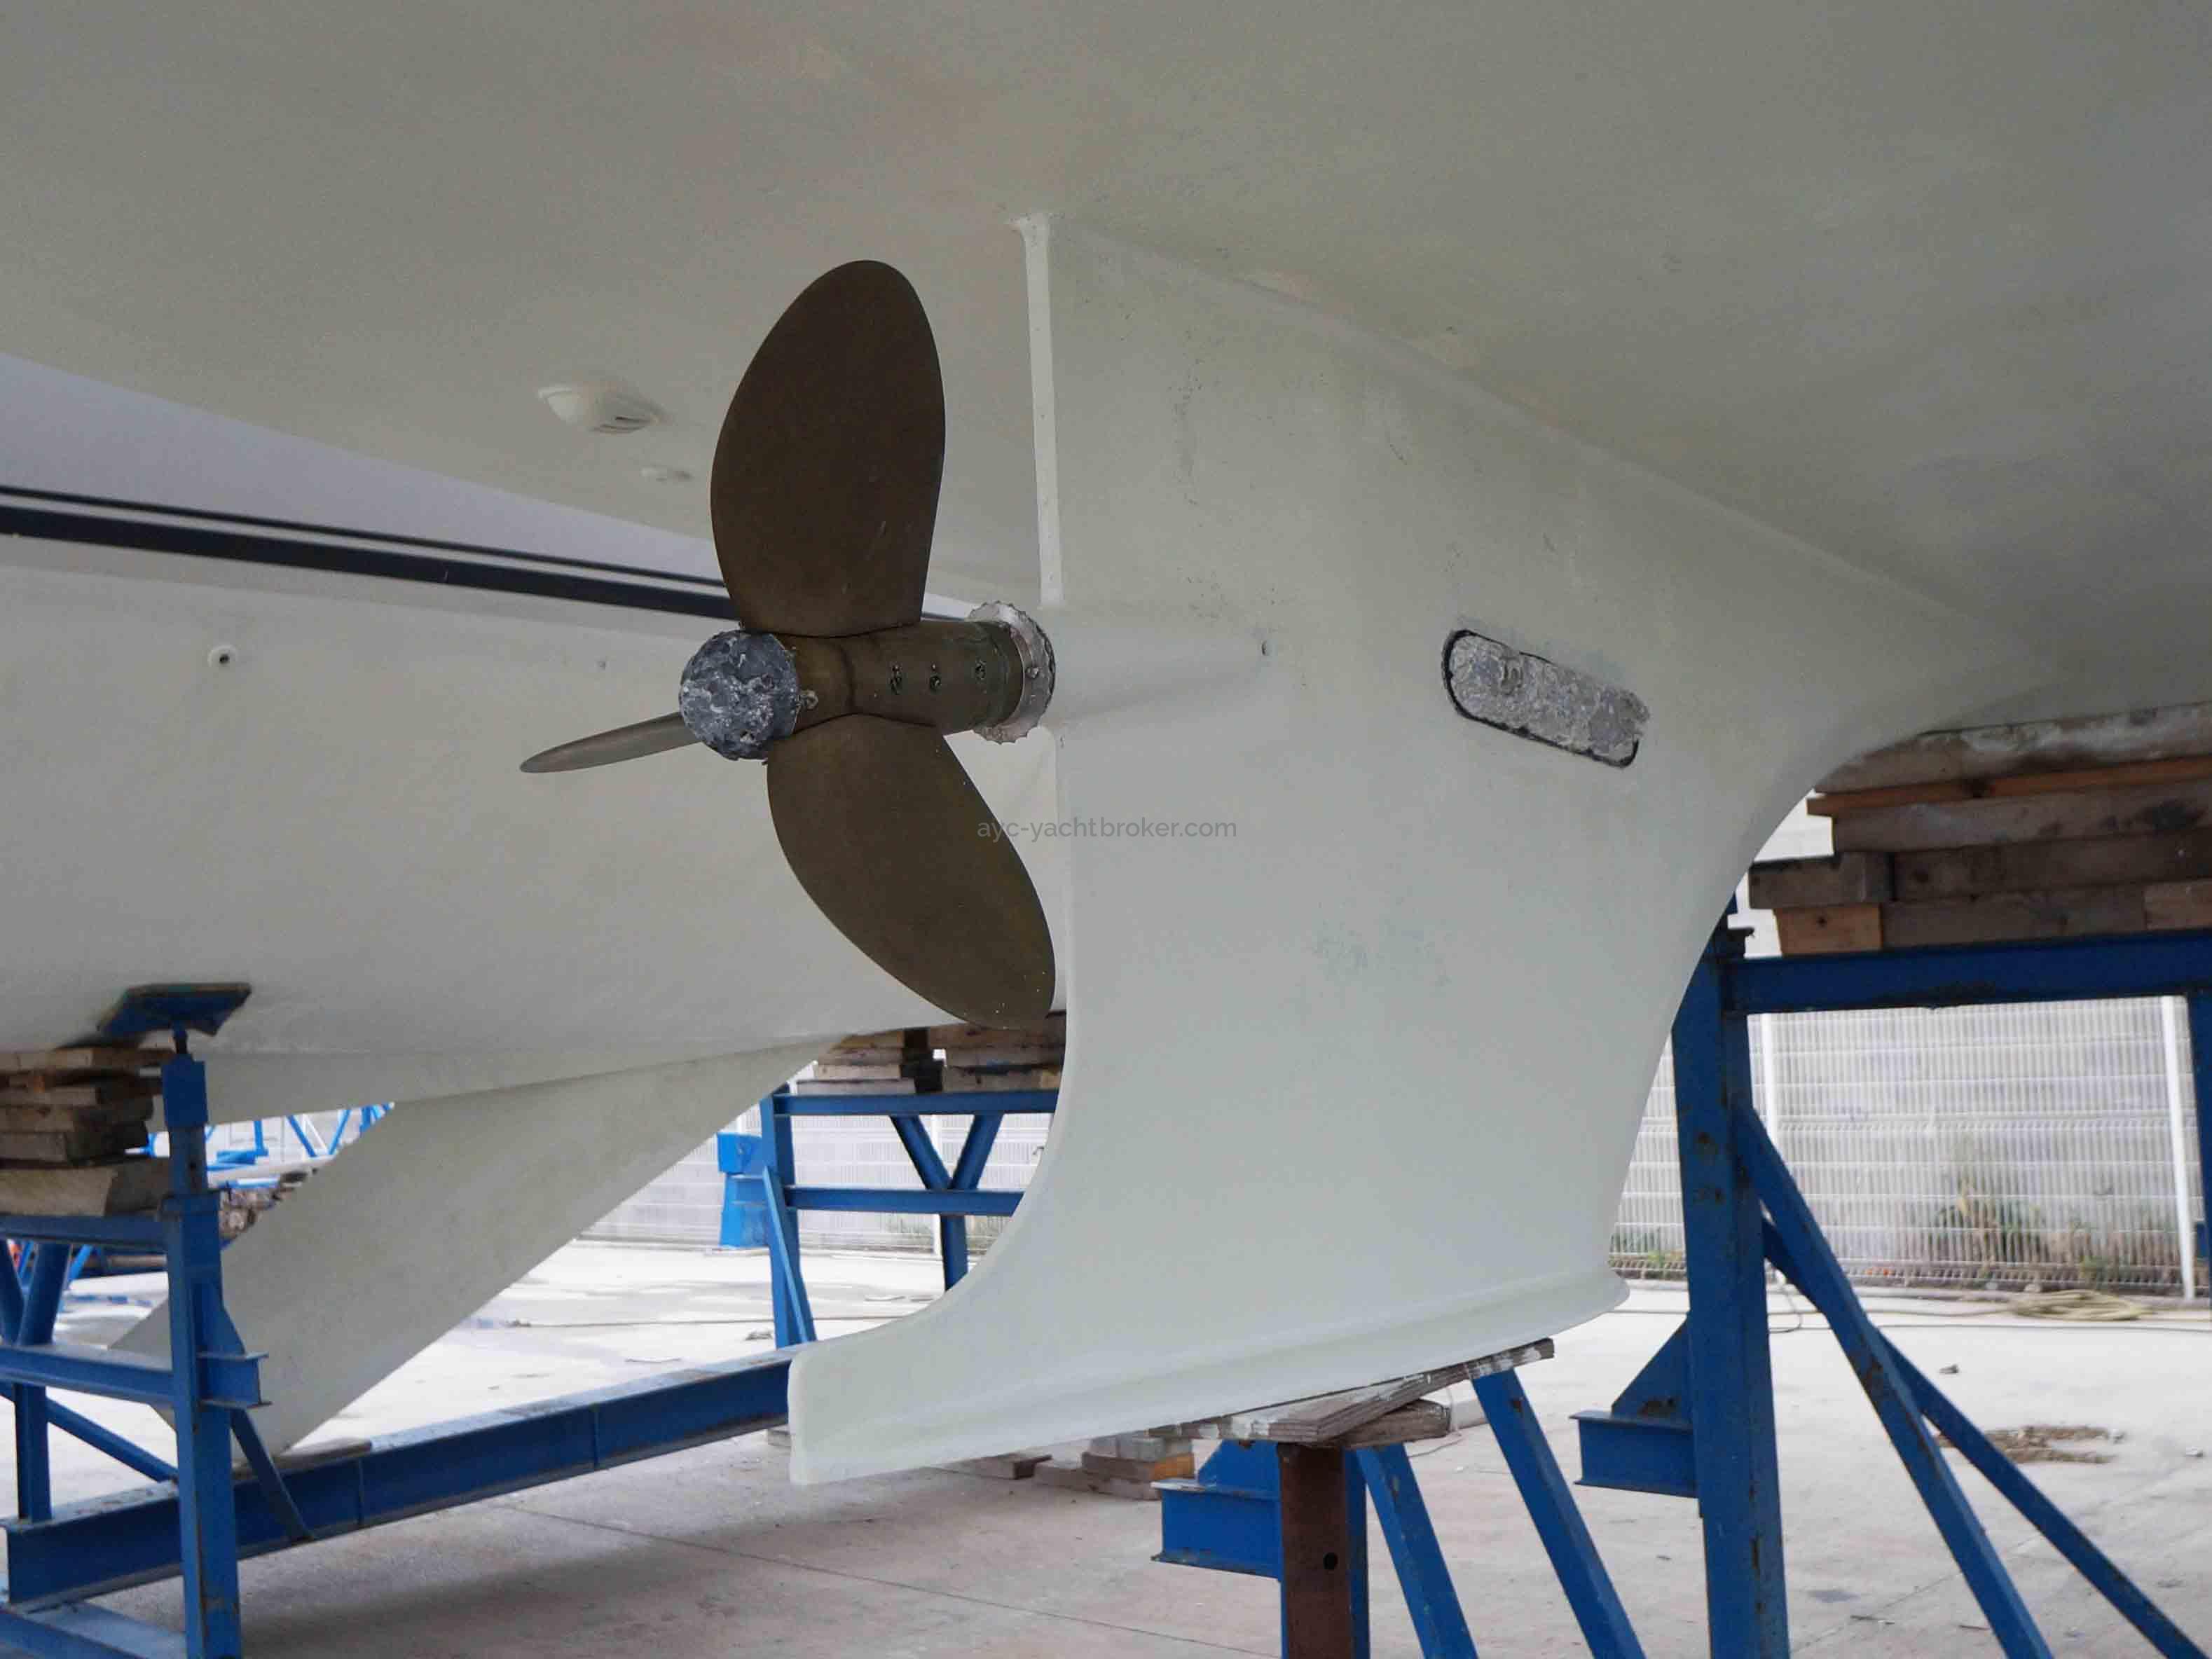 AYC Yachtbroker - Hélice